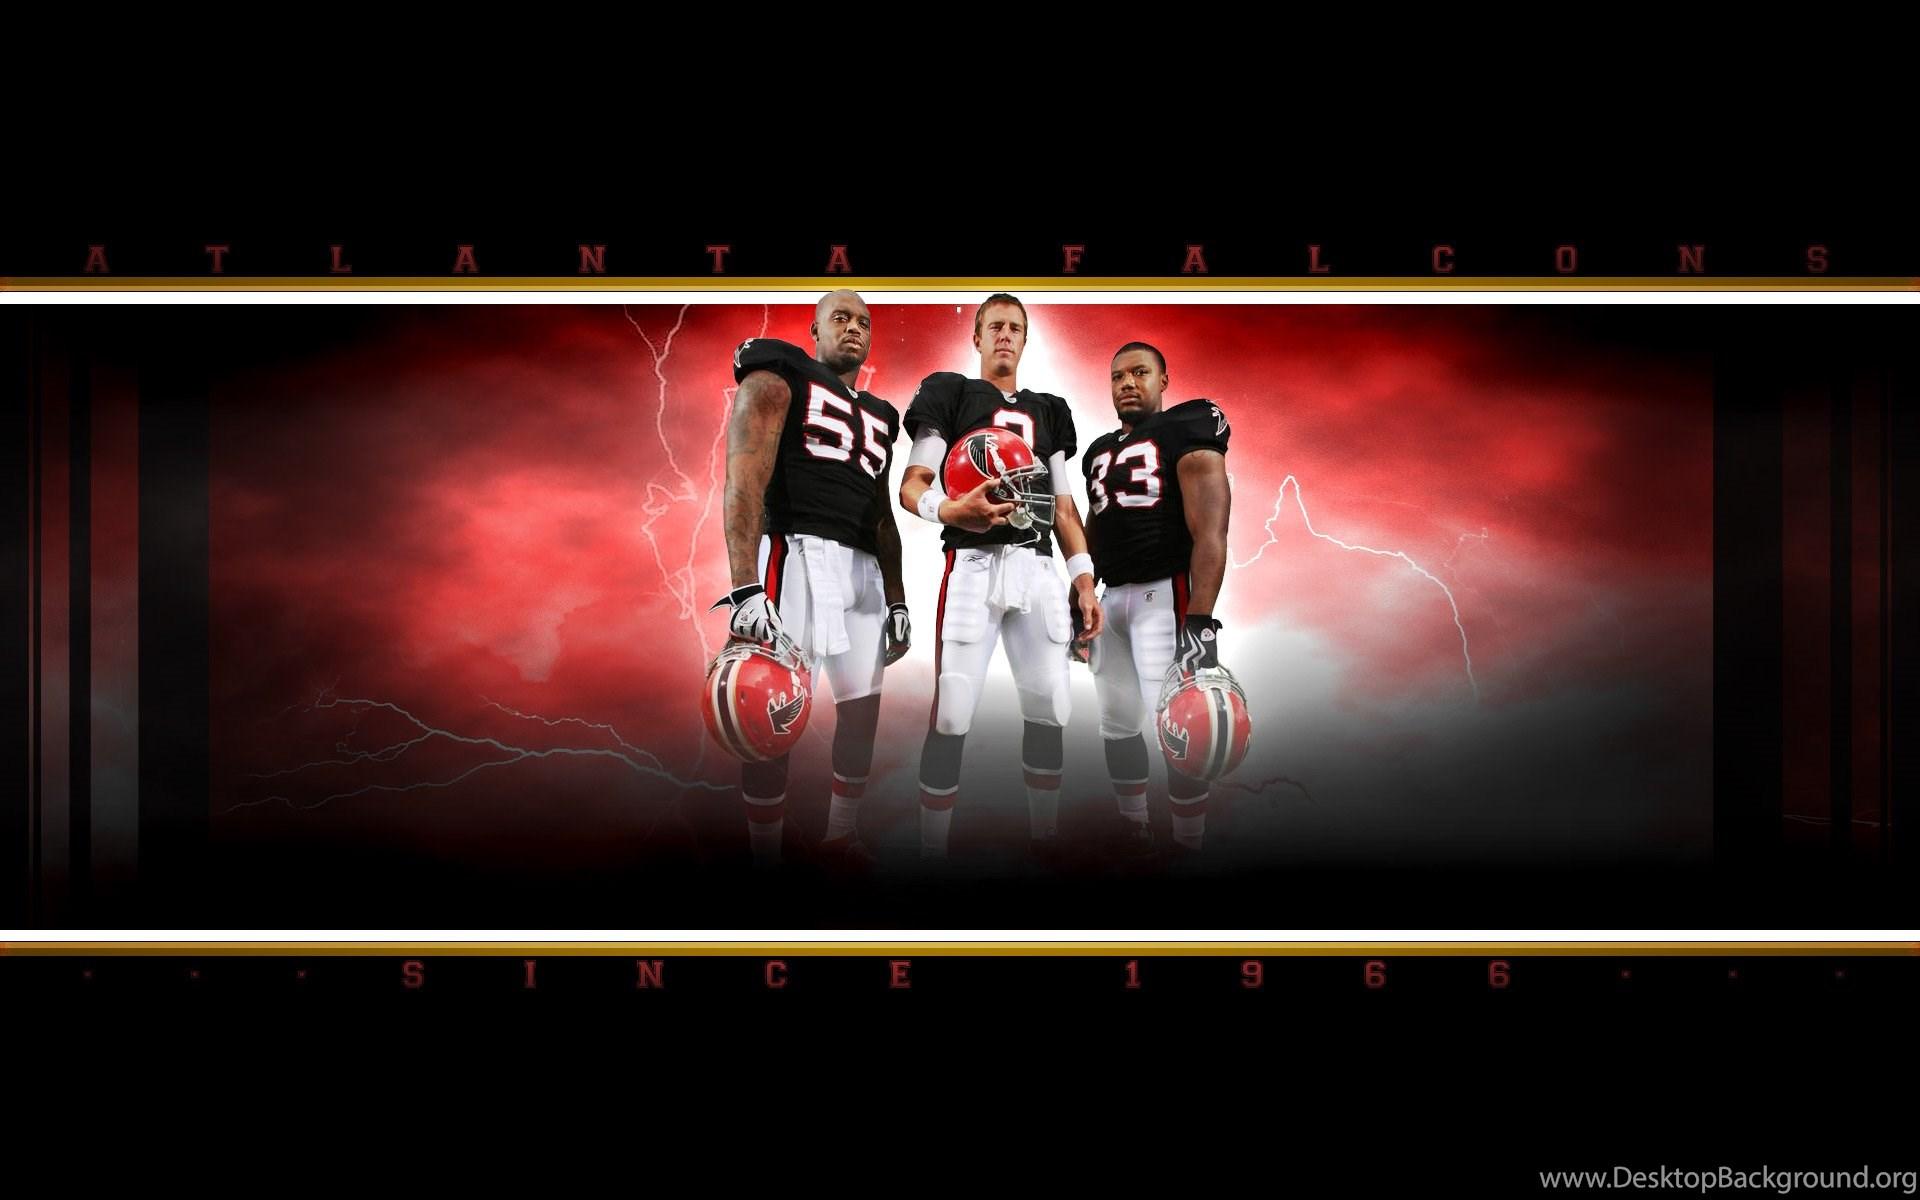 Atlanta Falcons Wallpapers Free Download Desktop Background